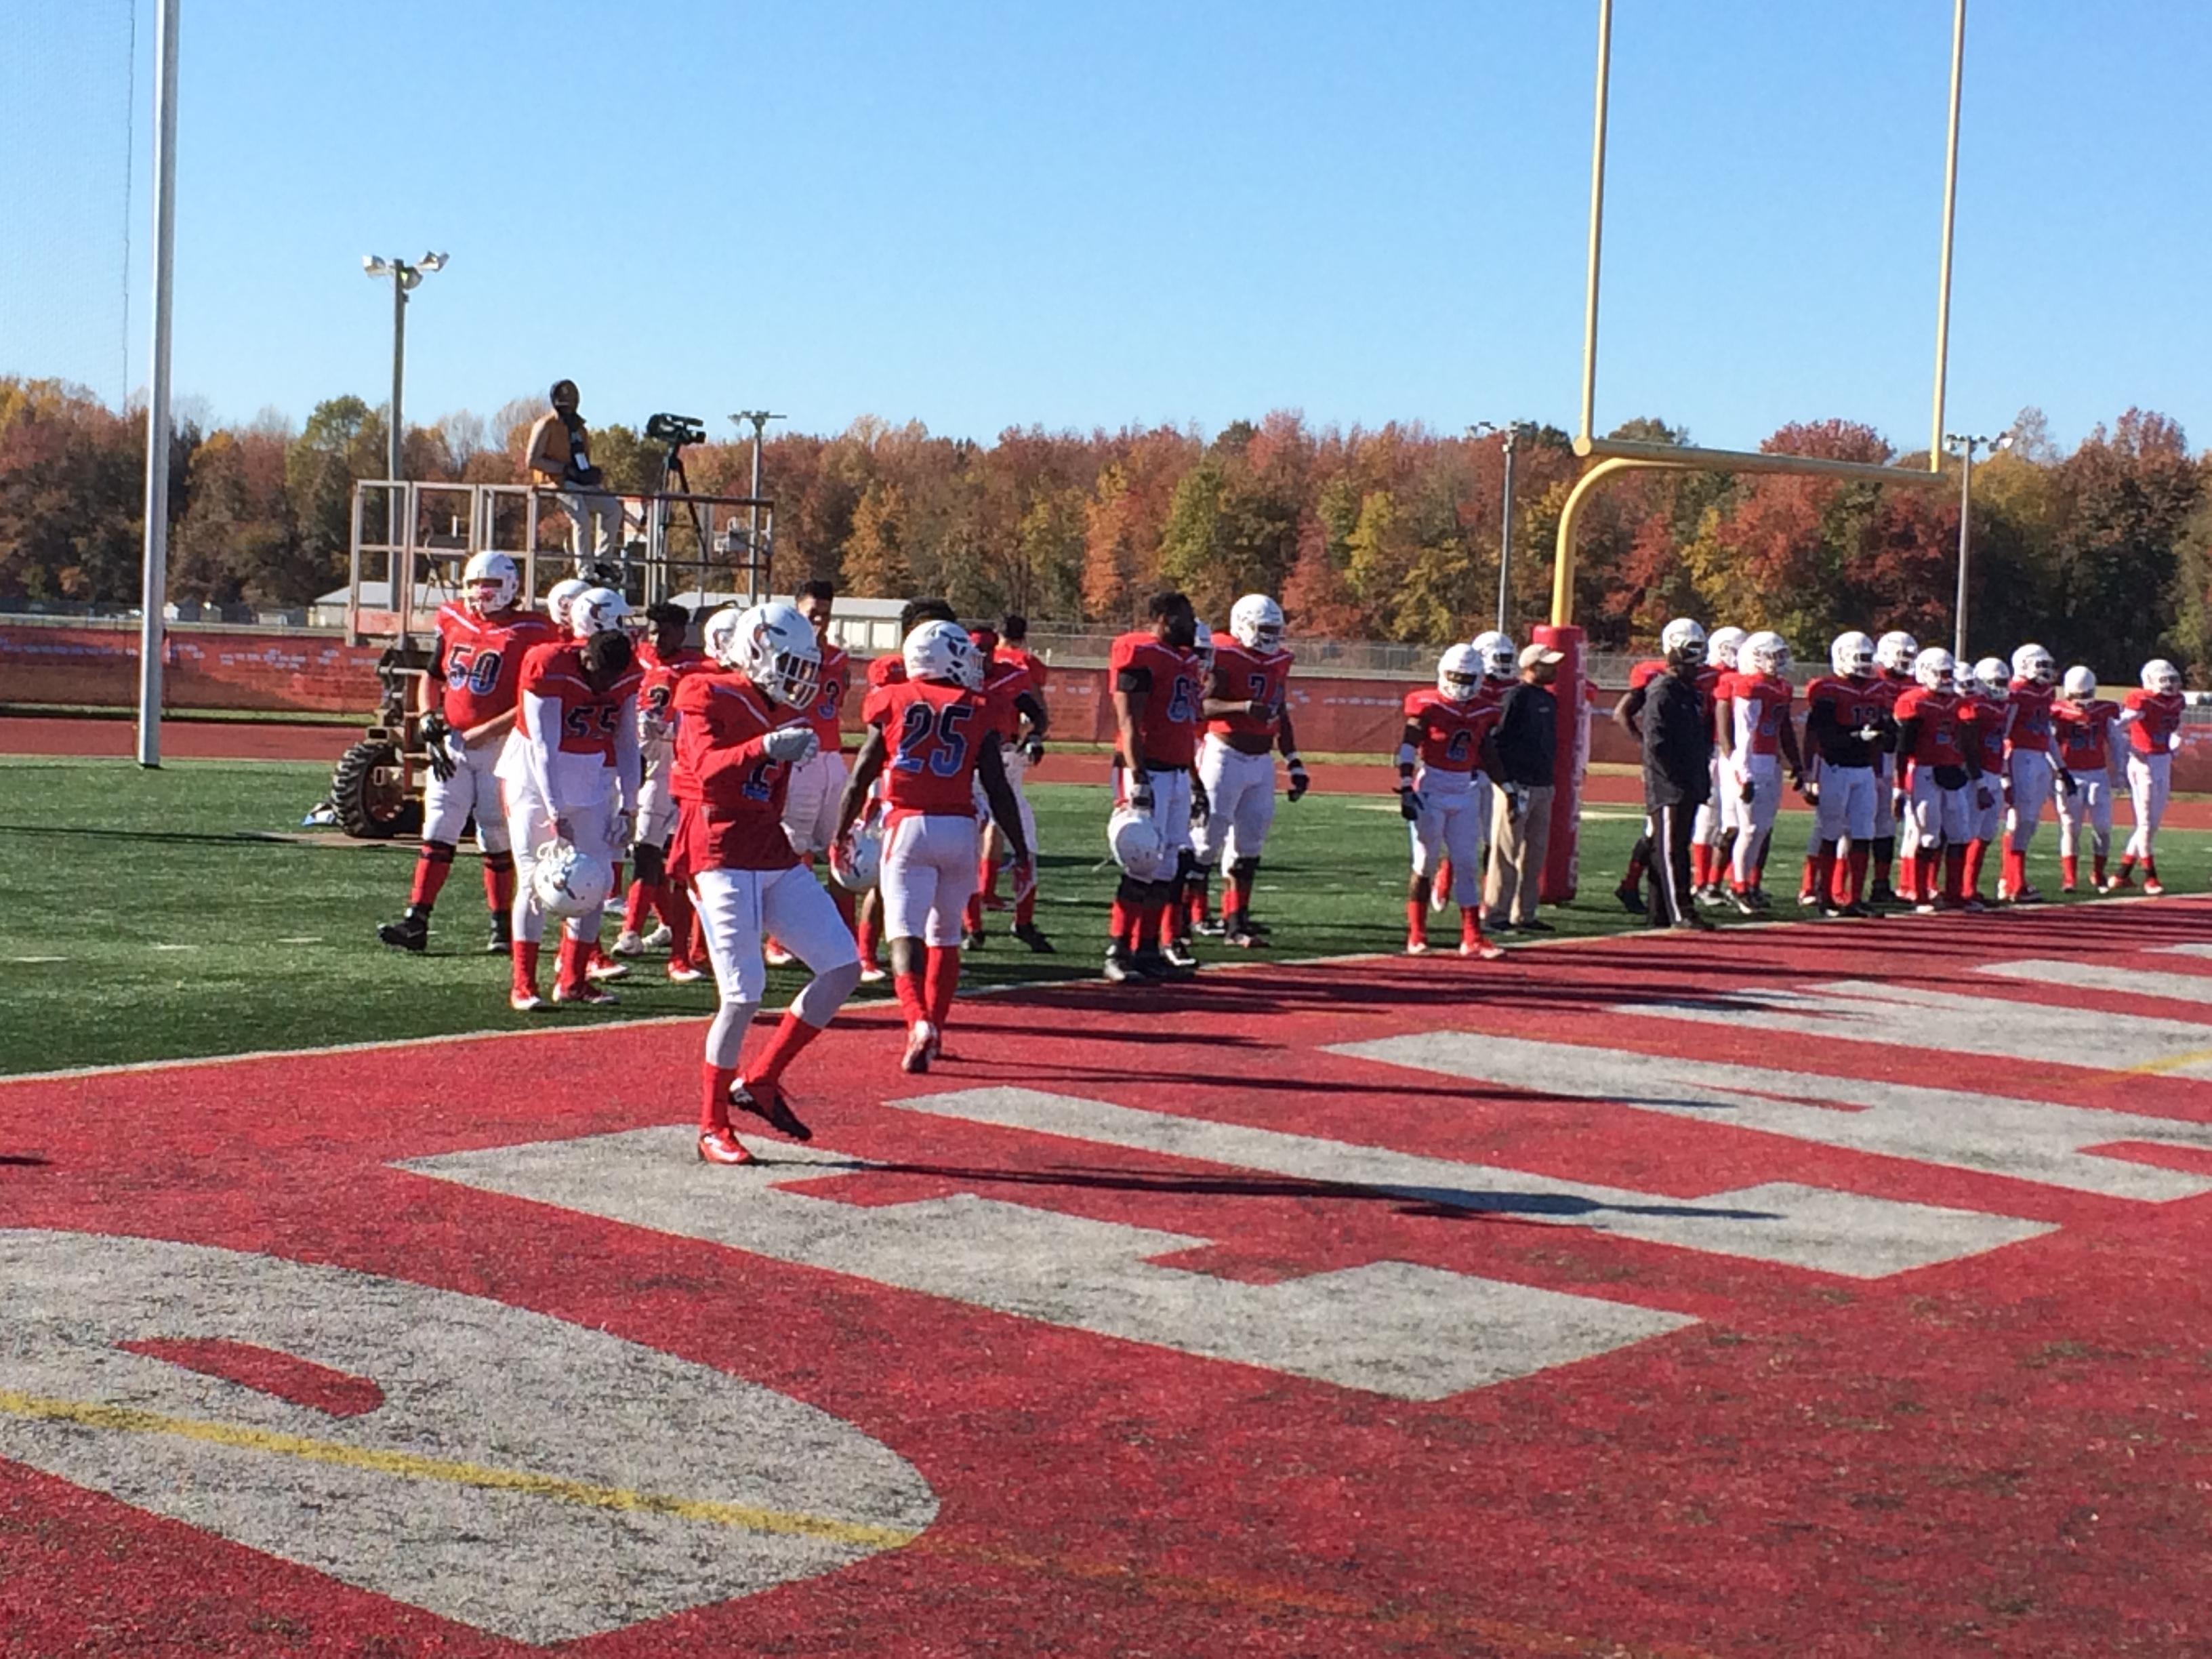 Delaware State Begins Spring Football Practice